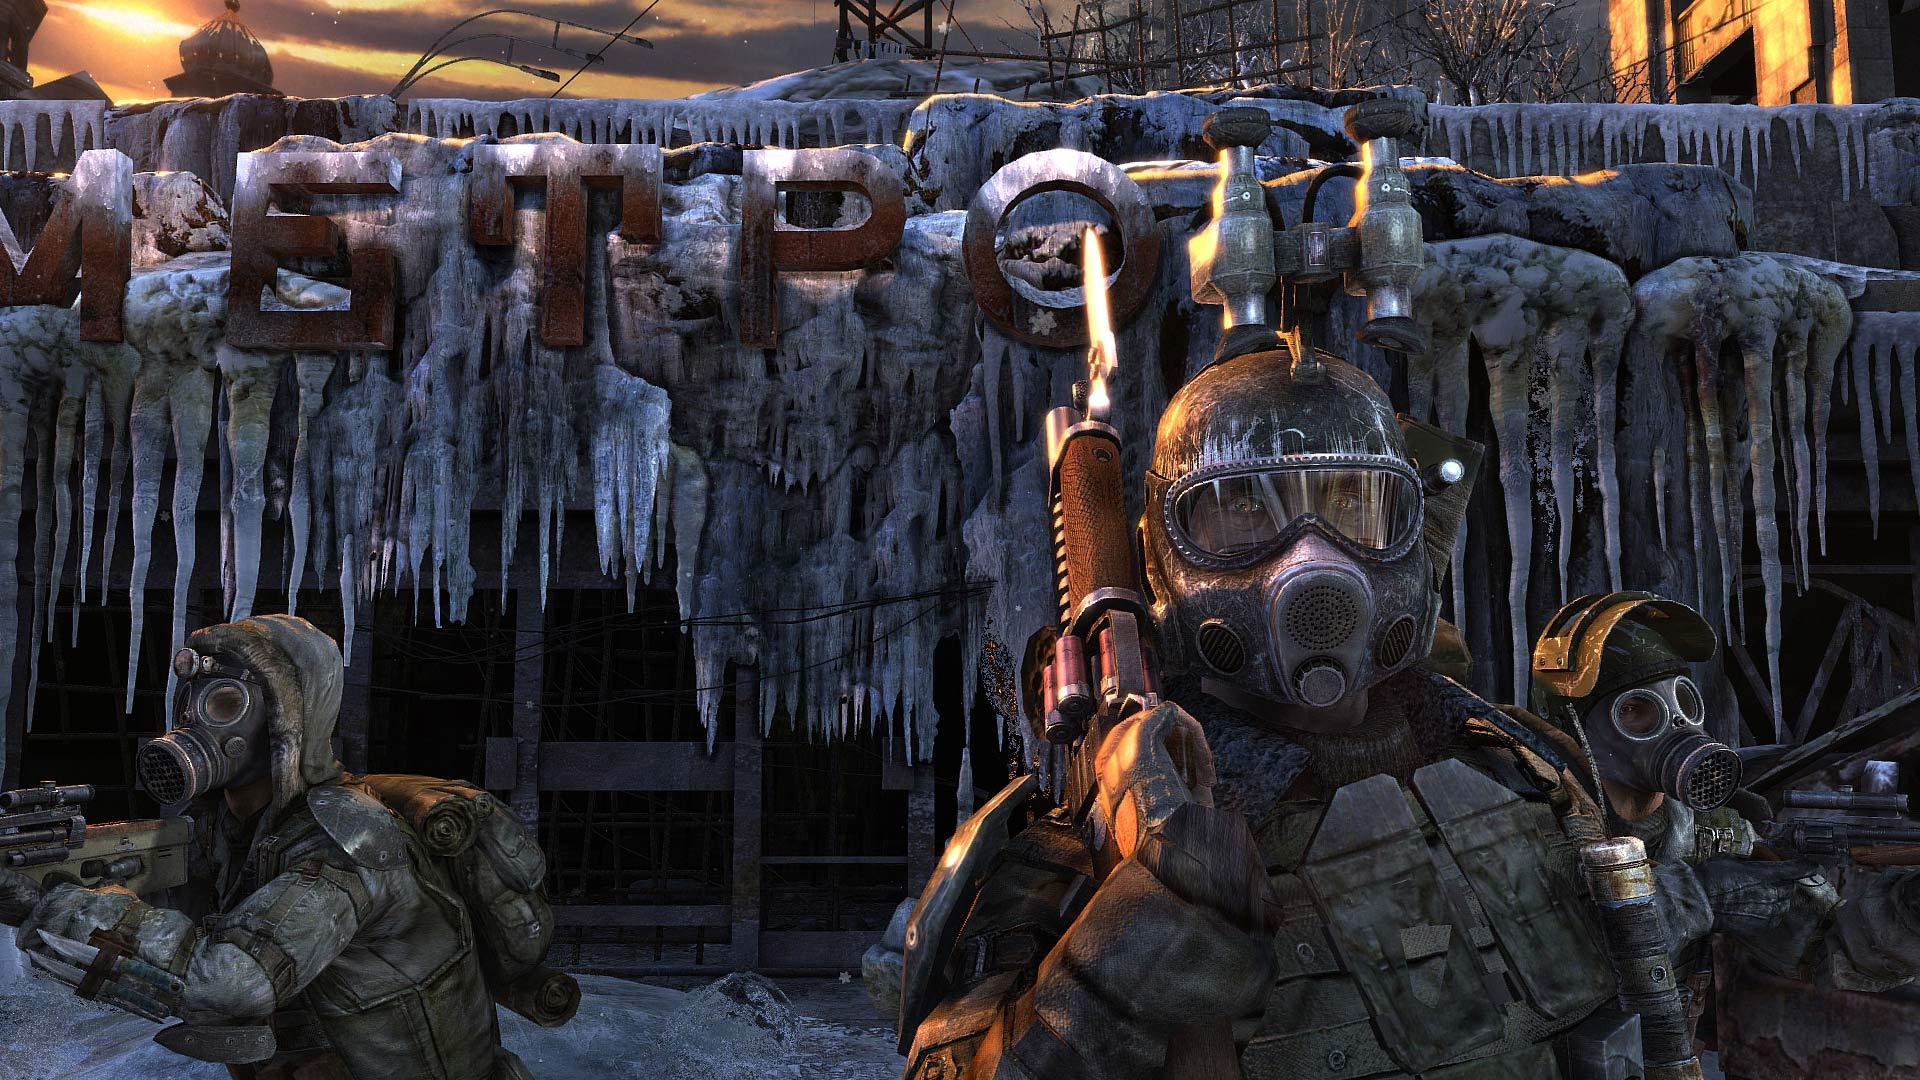 Primeras screenshots ingame de Metro 2033 se ven impresionantes! [Screens]